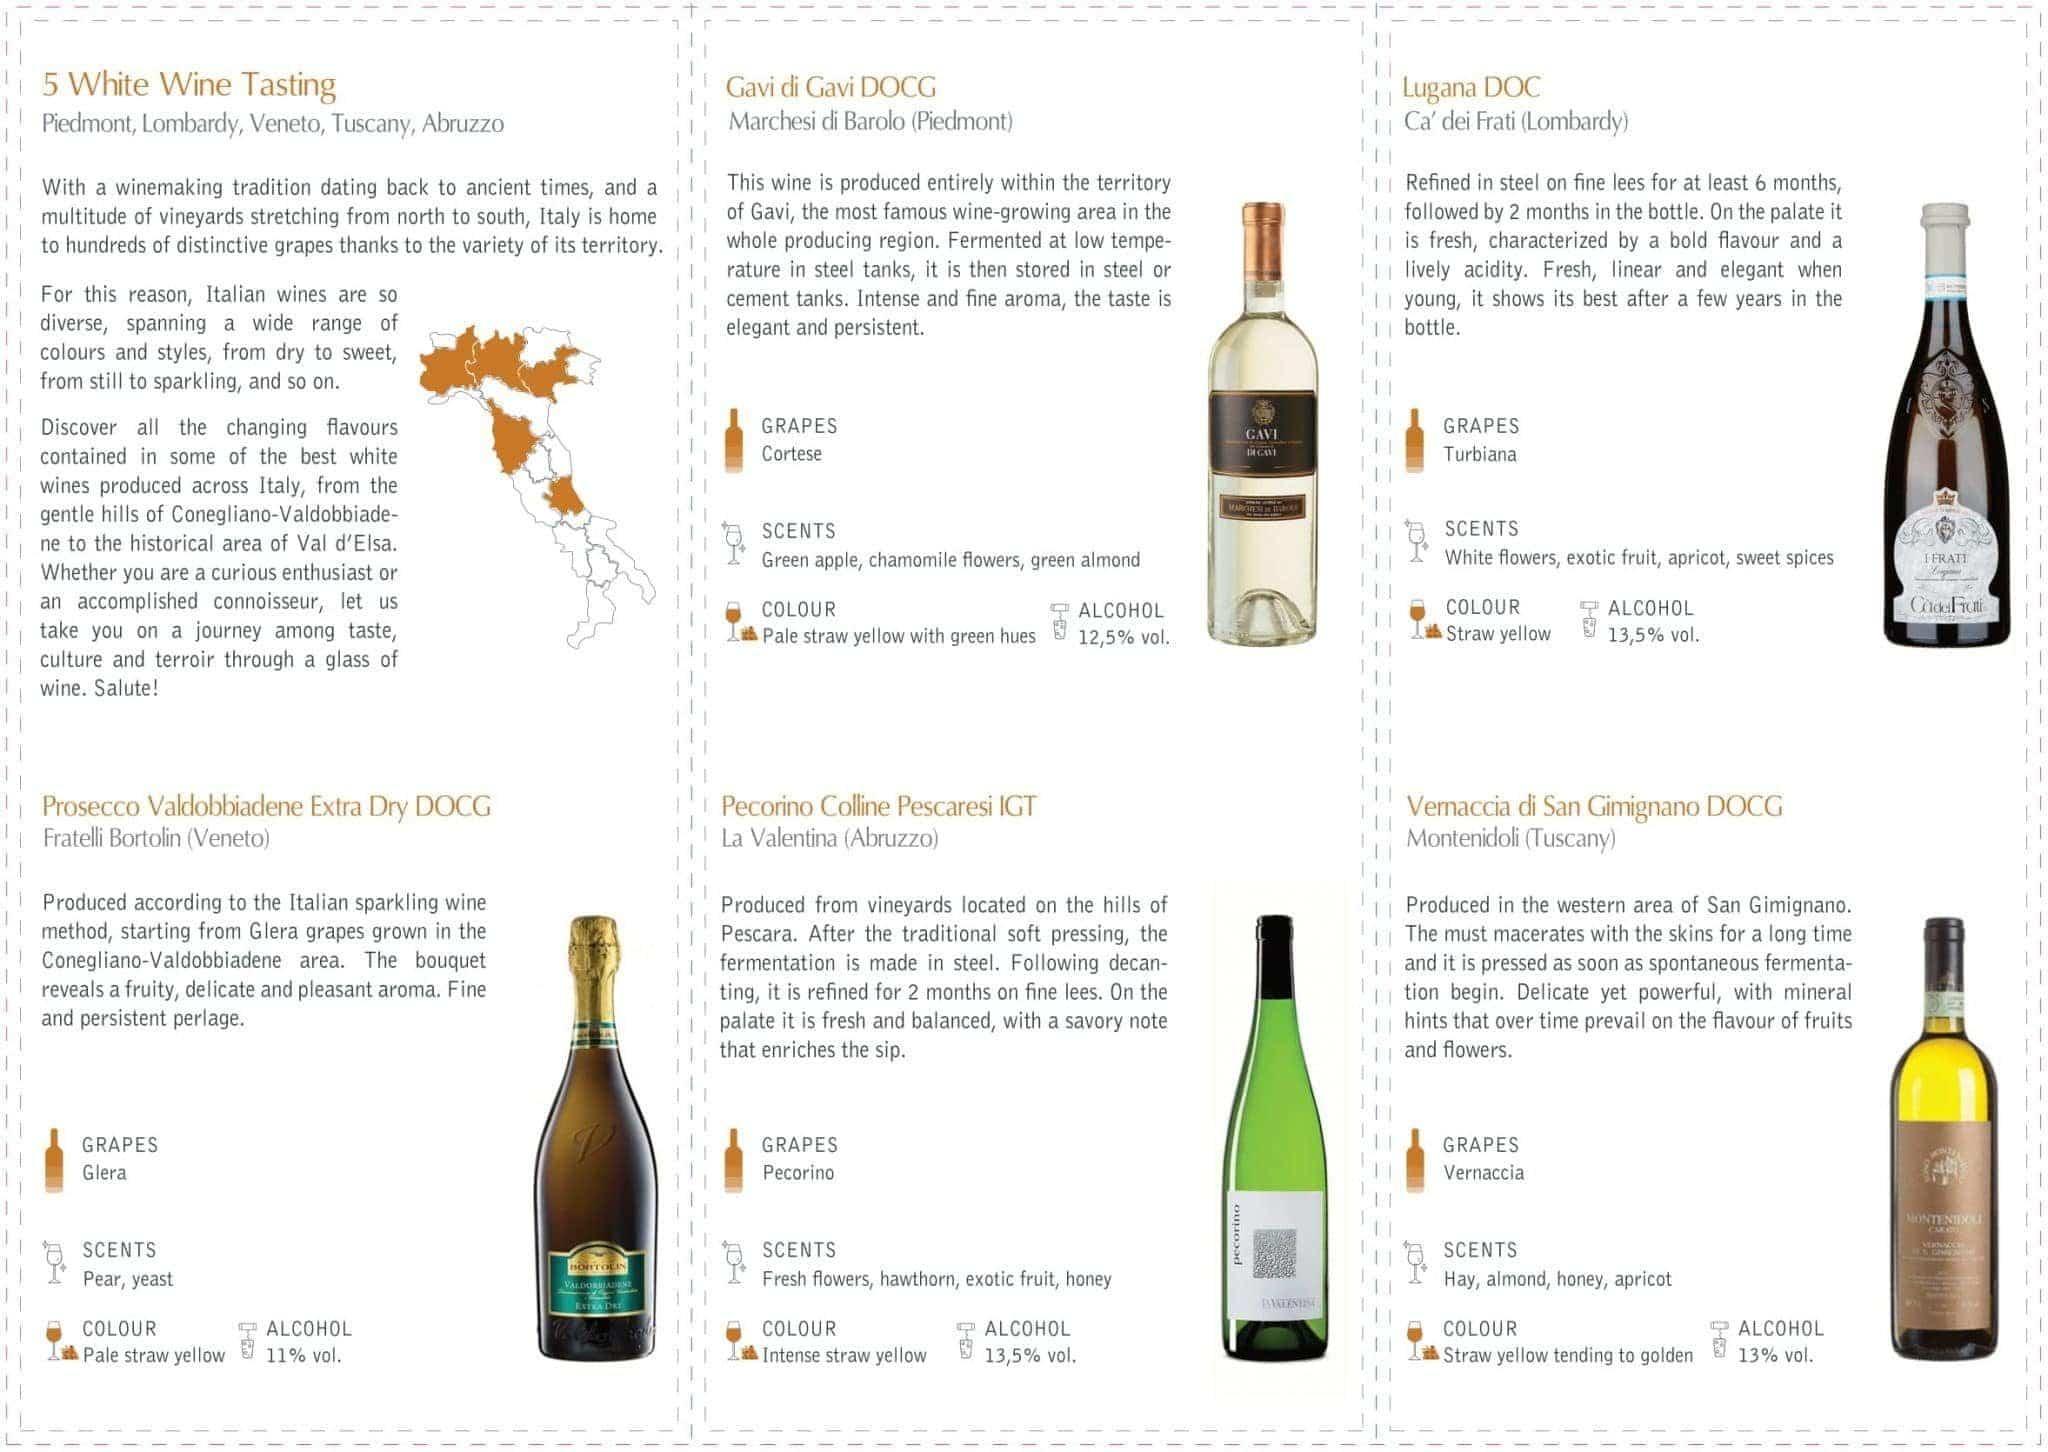 White Wine Tasting at Vineria all'Amarone